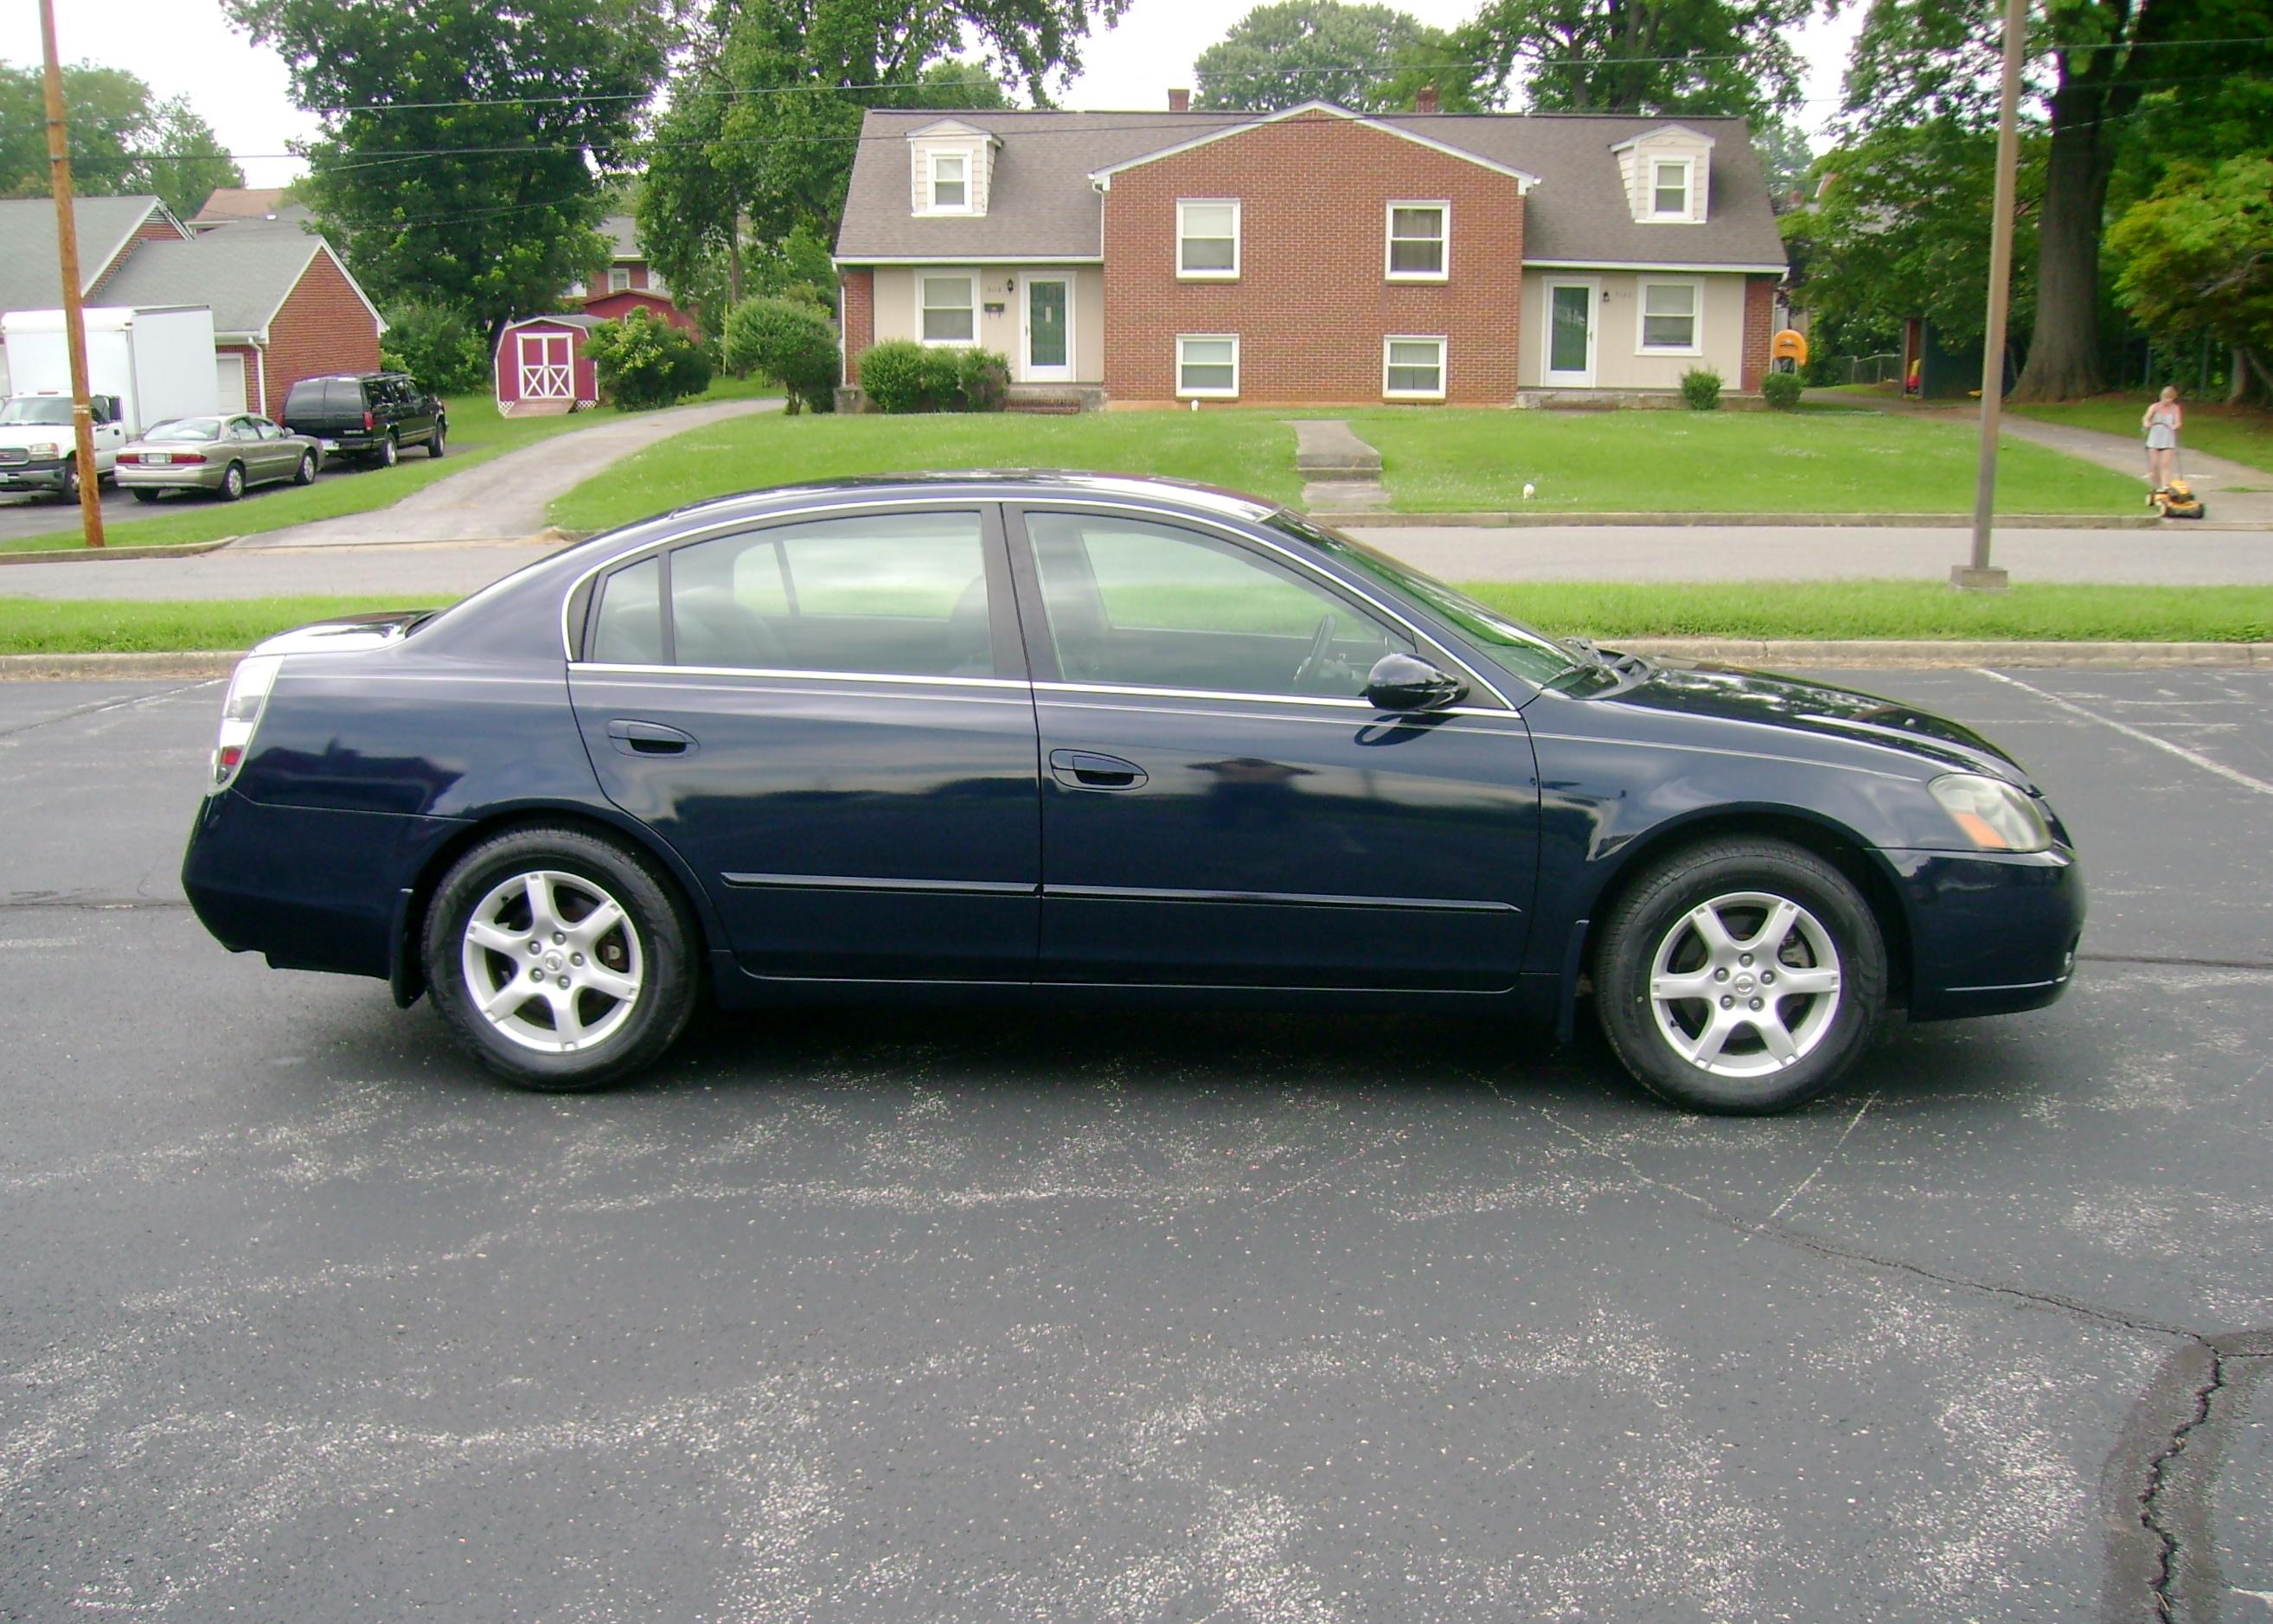 2005 Nissan Altima 2.5s U003eu003e 2005 Nissan Altima 004 2005 Nissan Altima 004 U2013